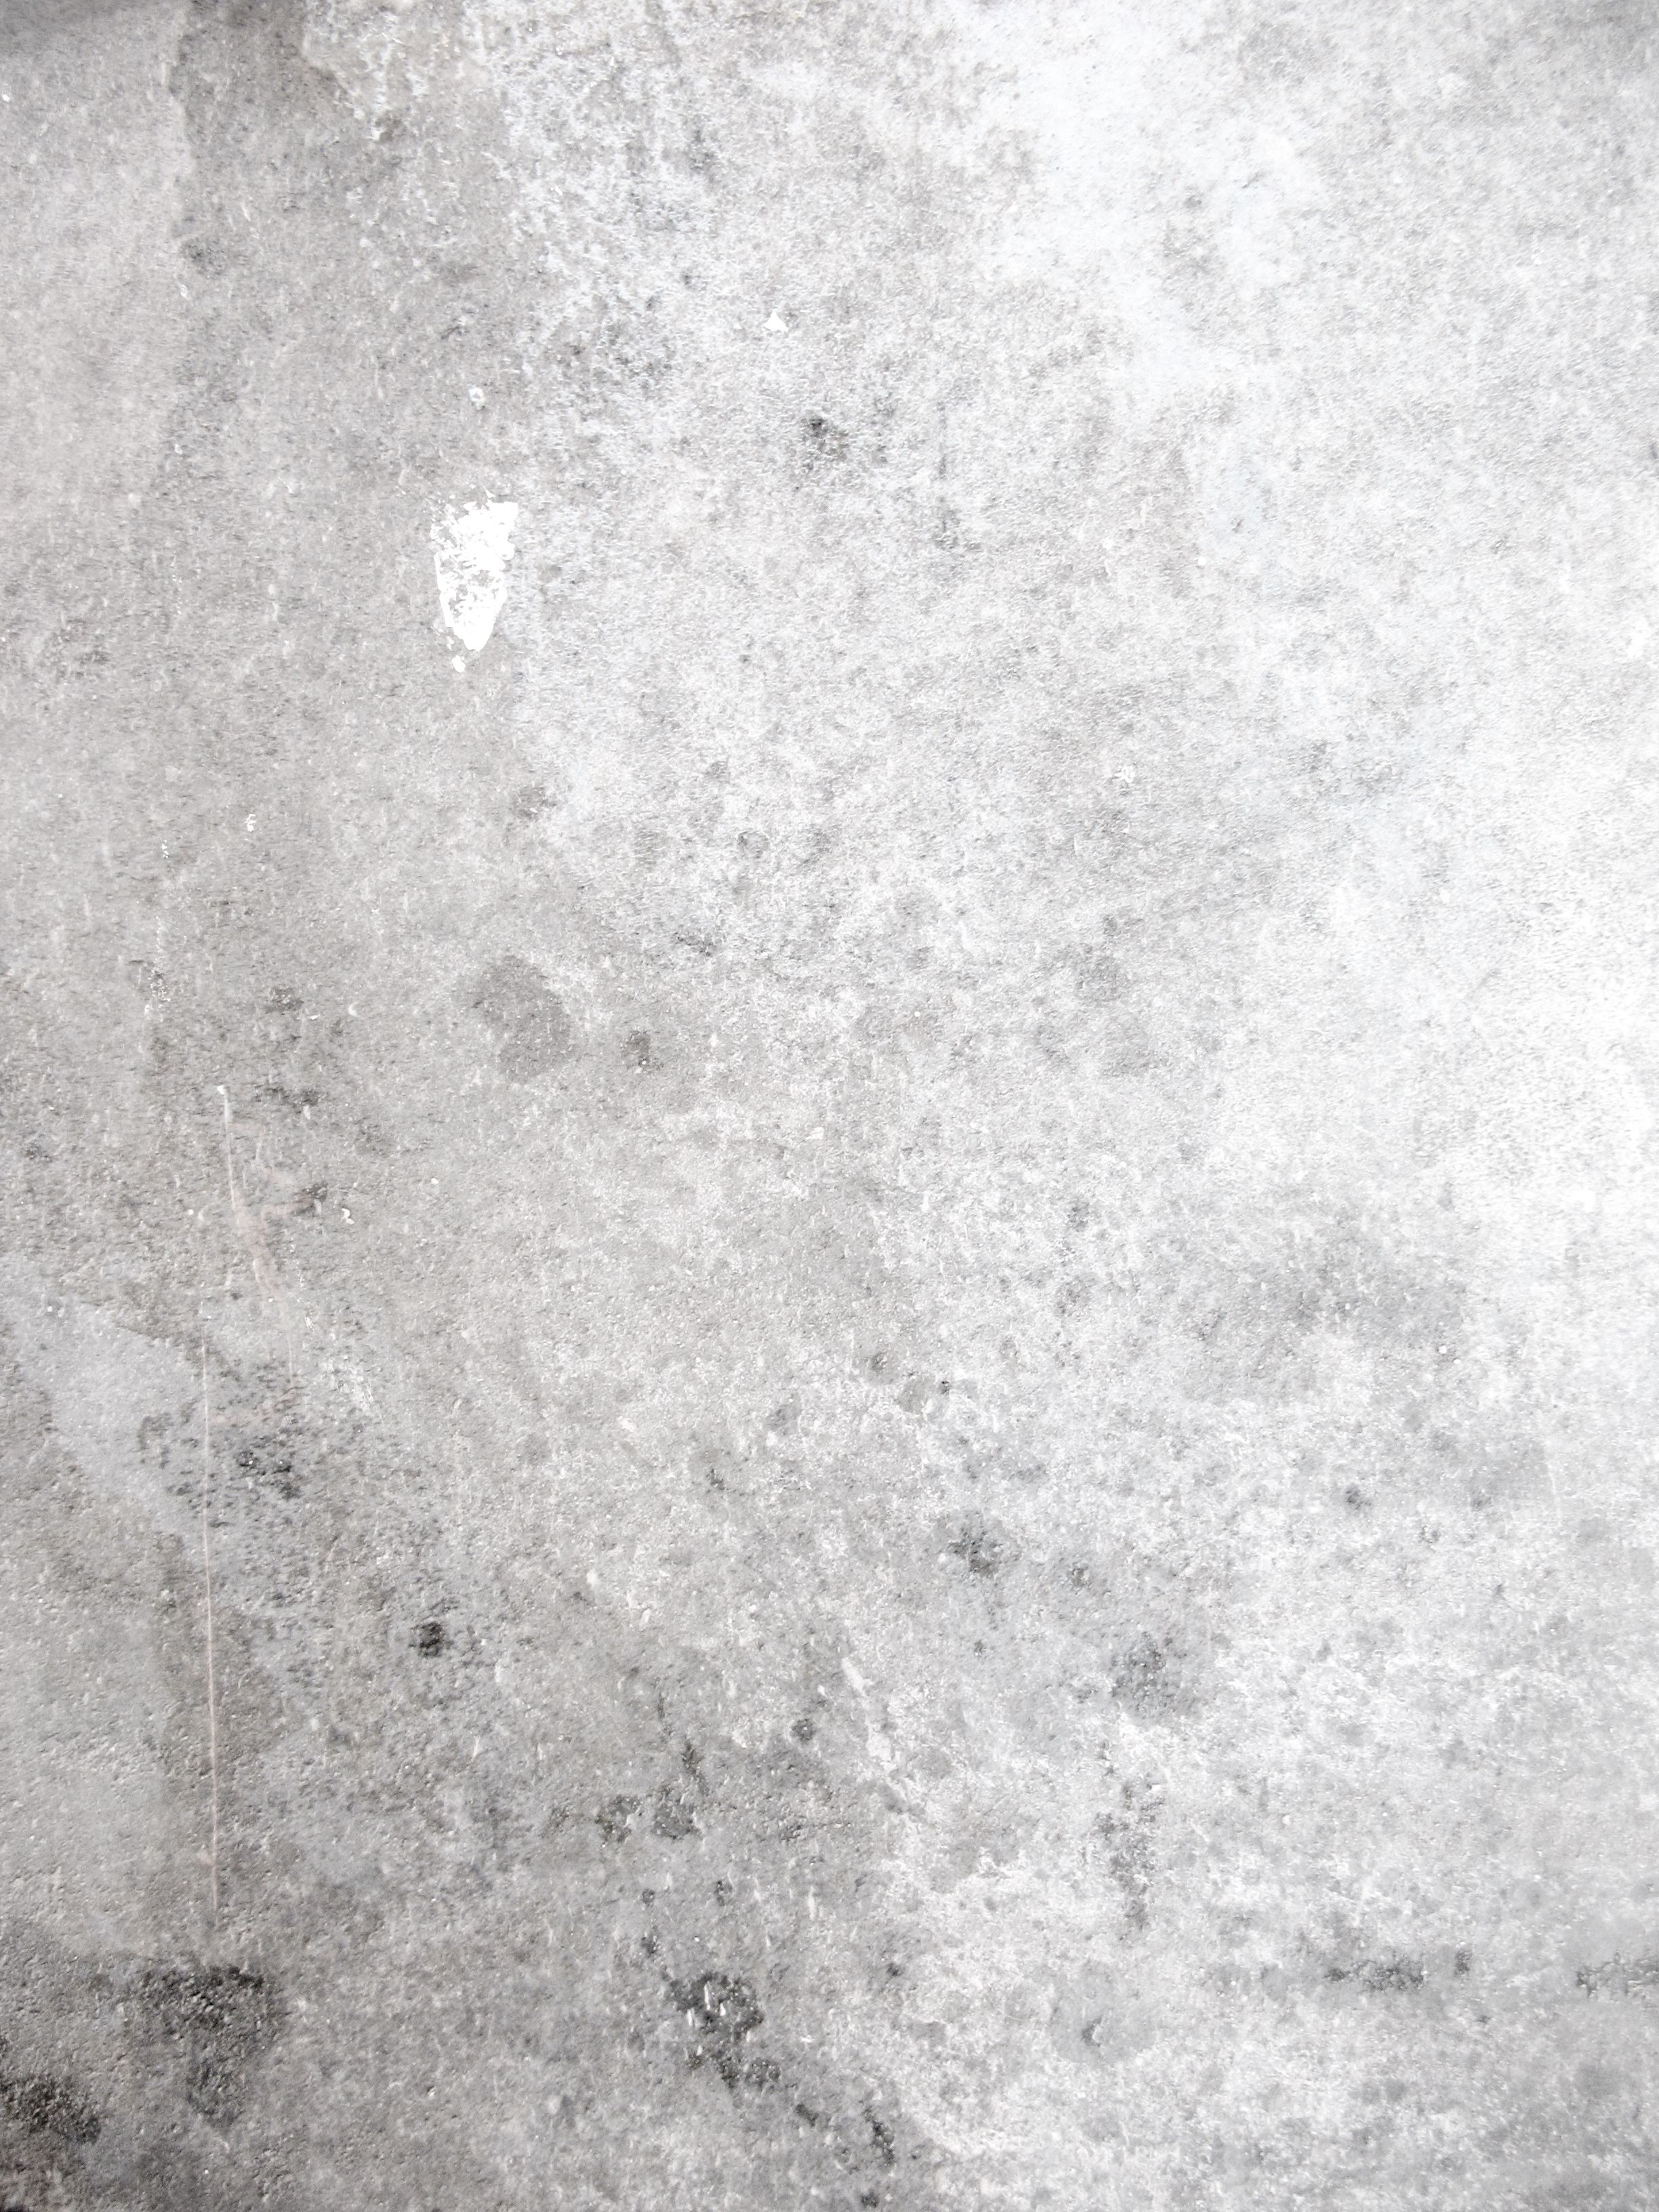 25 Subtle And Light Grunge Textures Pinterest